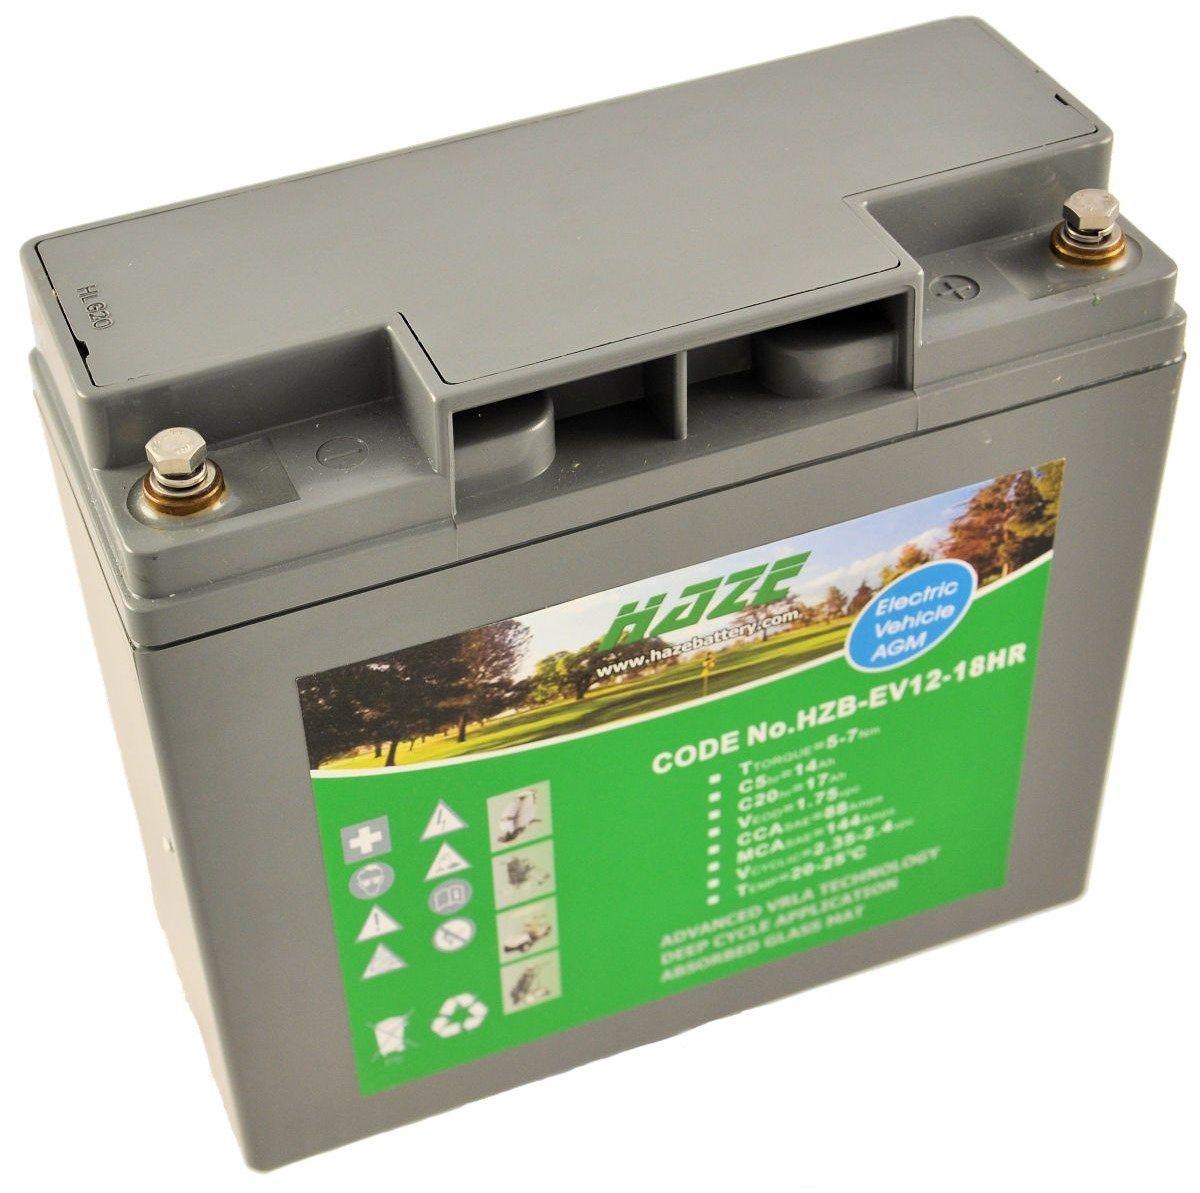 12V 17Ah Haze Sealed Lead Acid (AGM) Mobility Scooter Battery HZB12-18